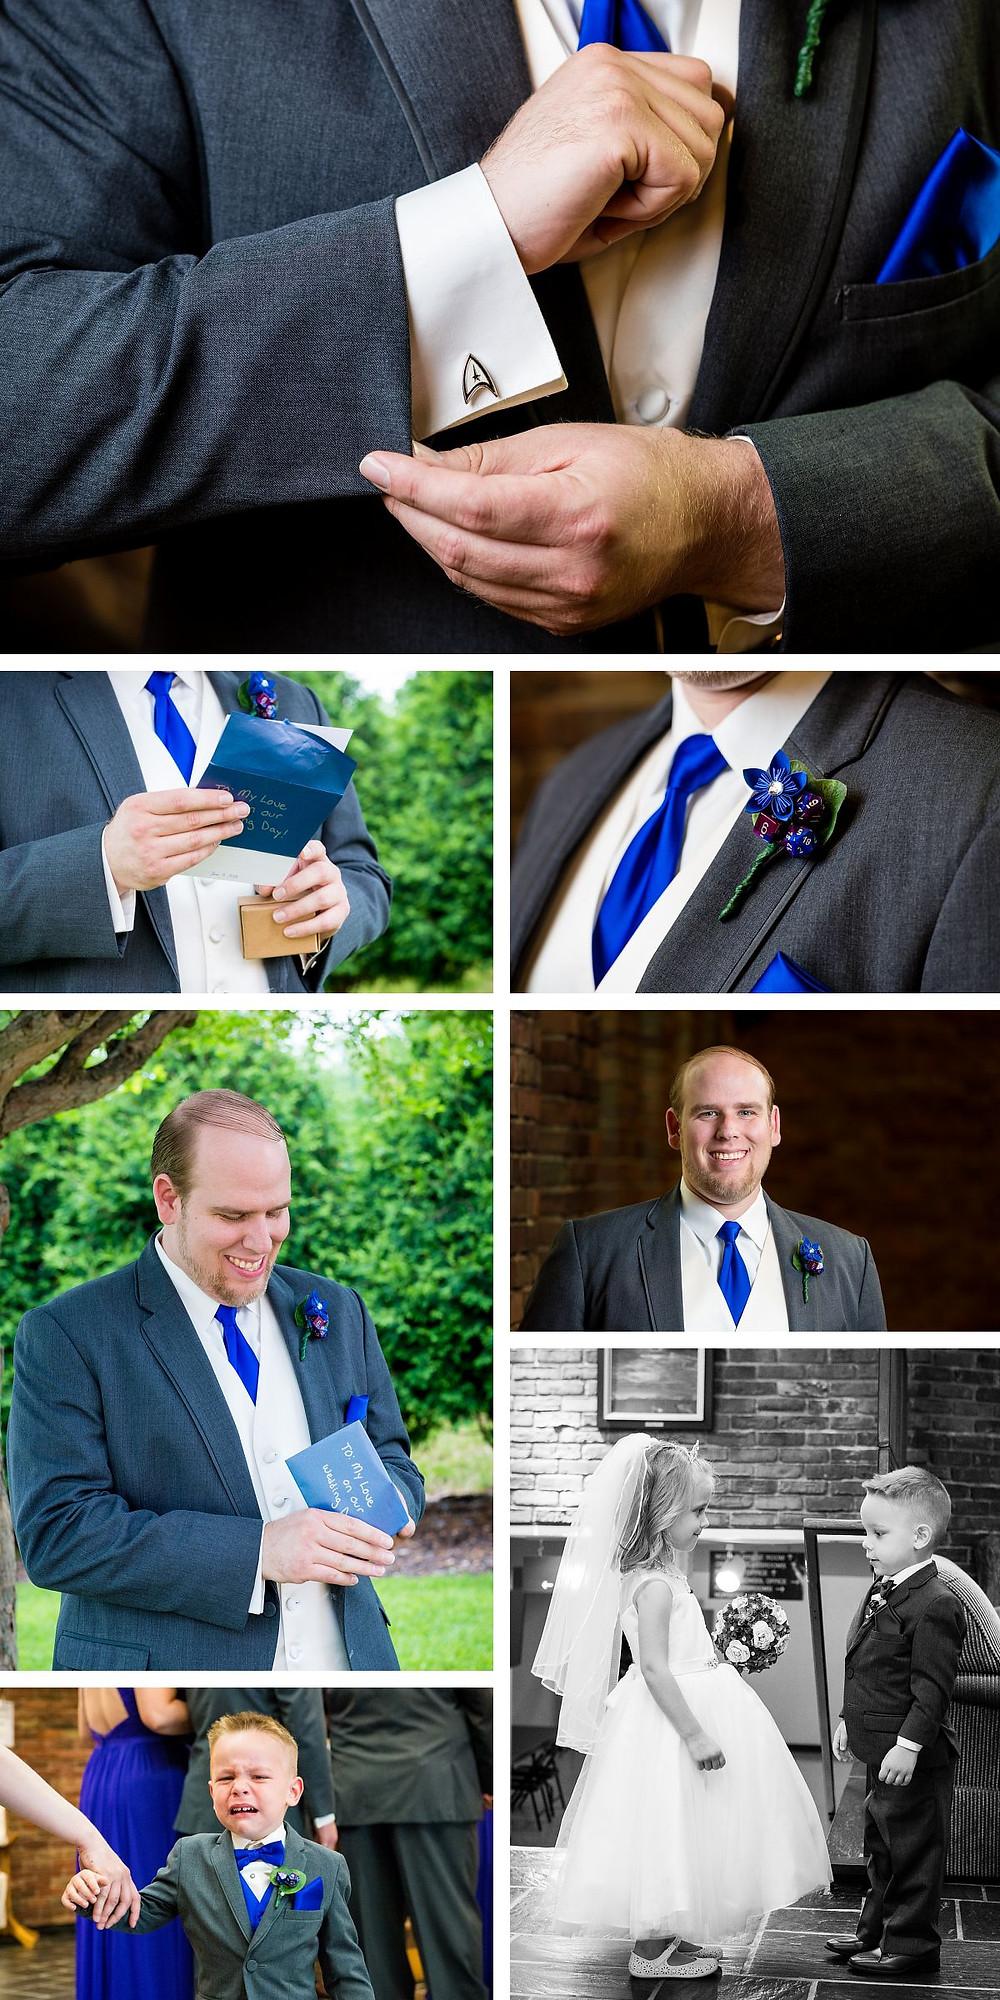 Star Trek wedding cuff links, Wisconsin Wedding Photography